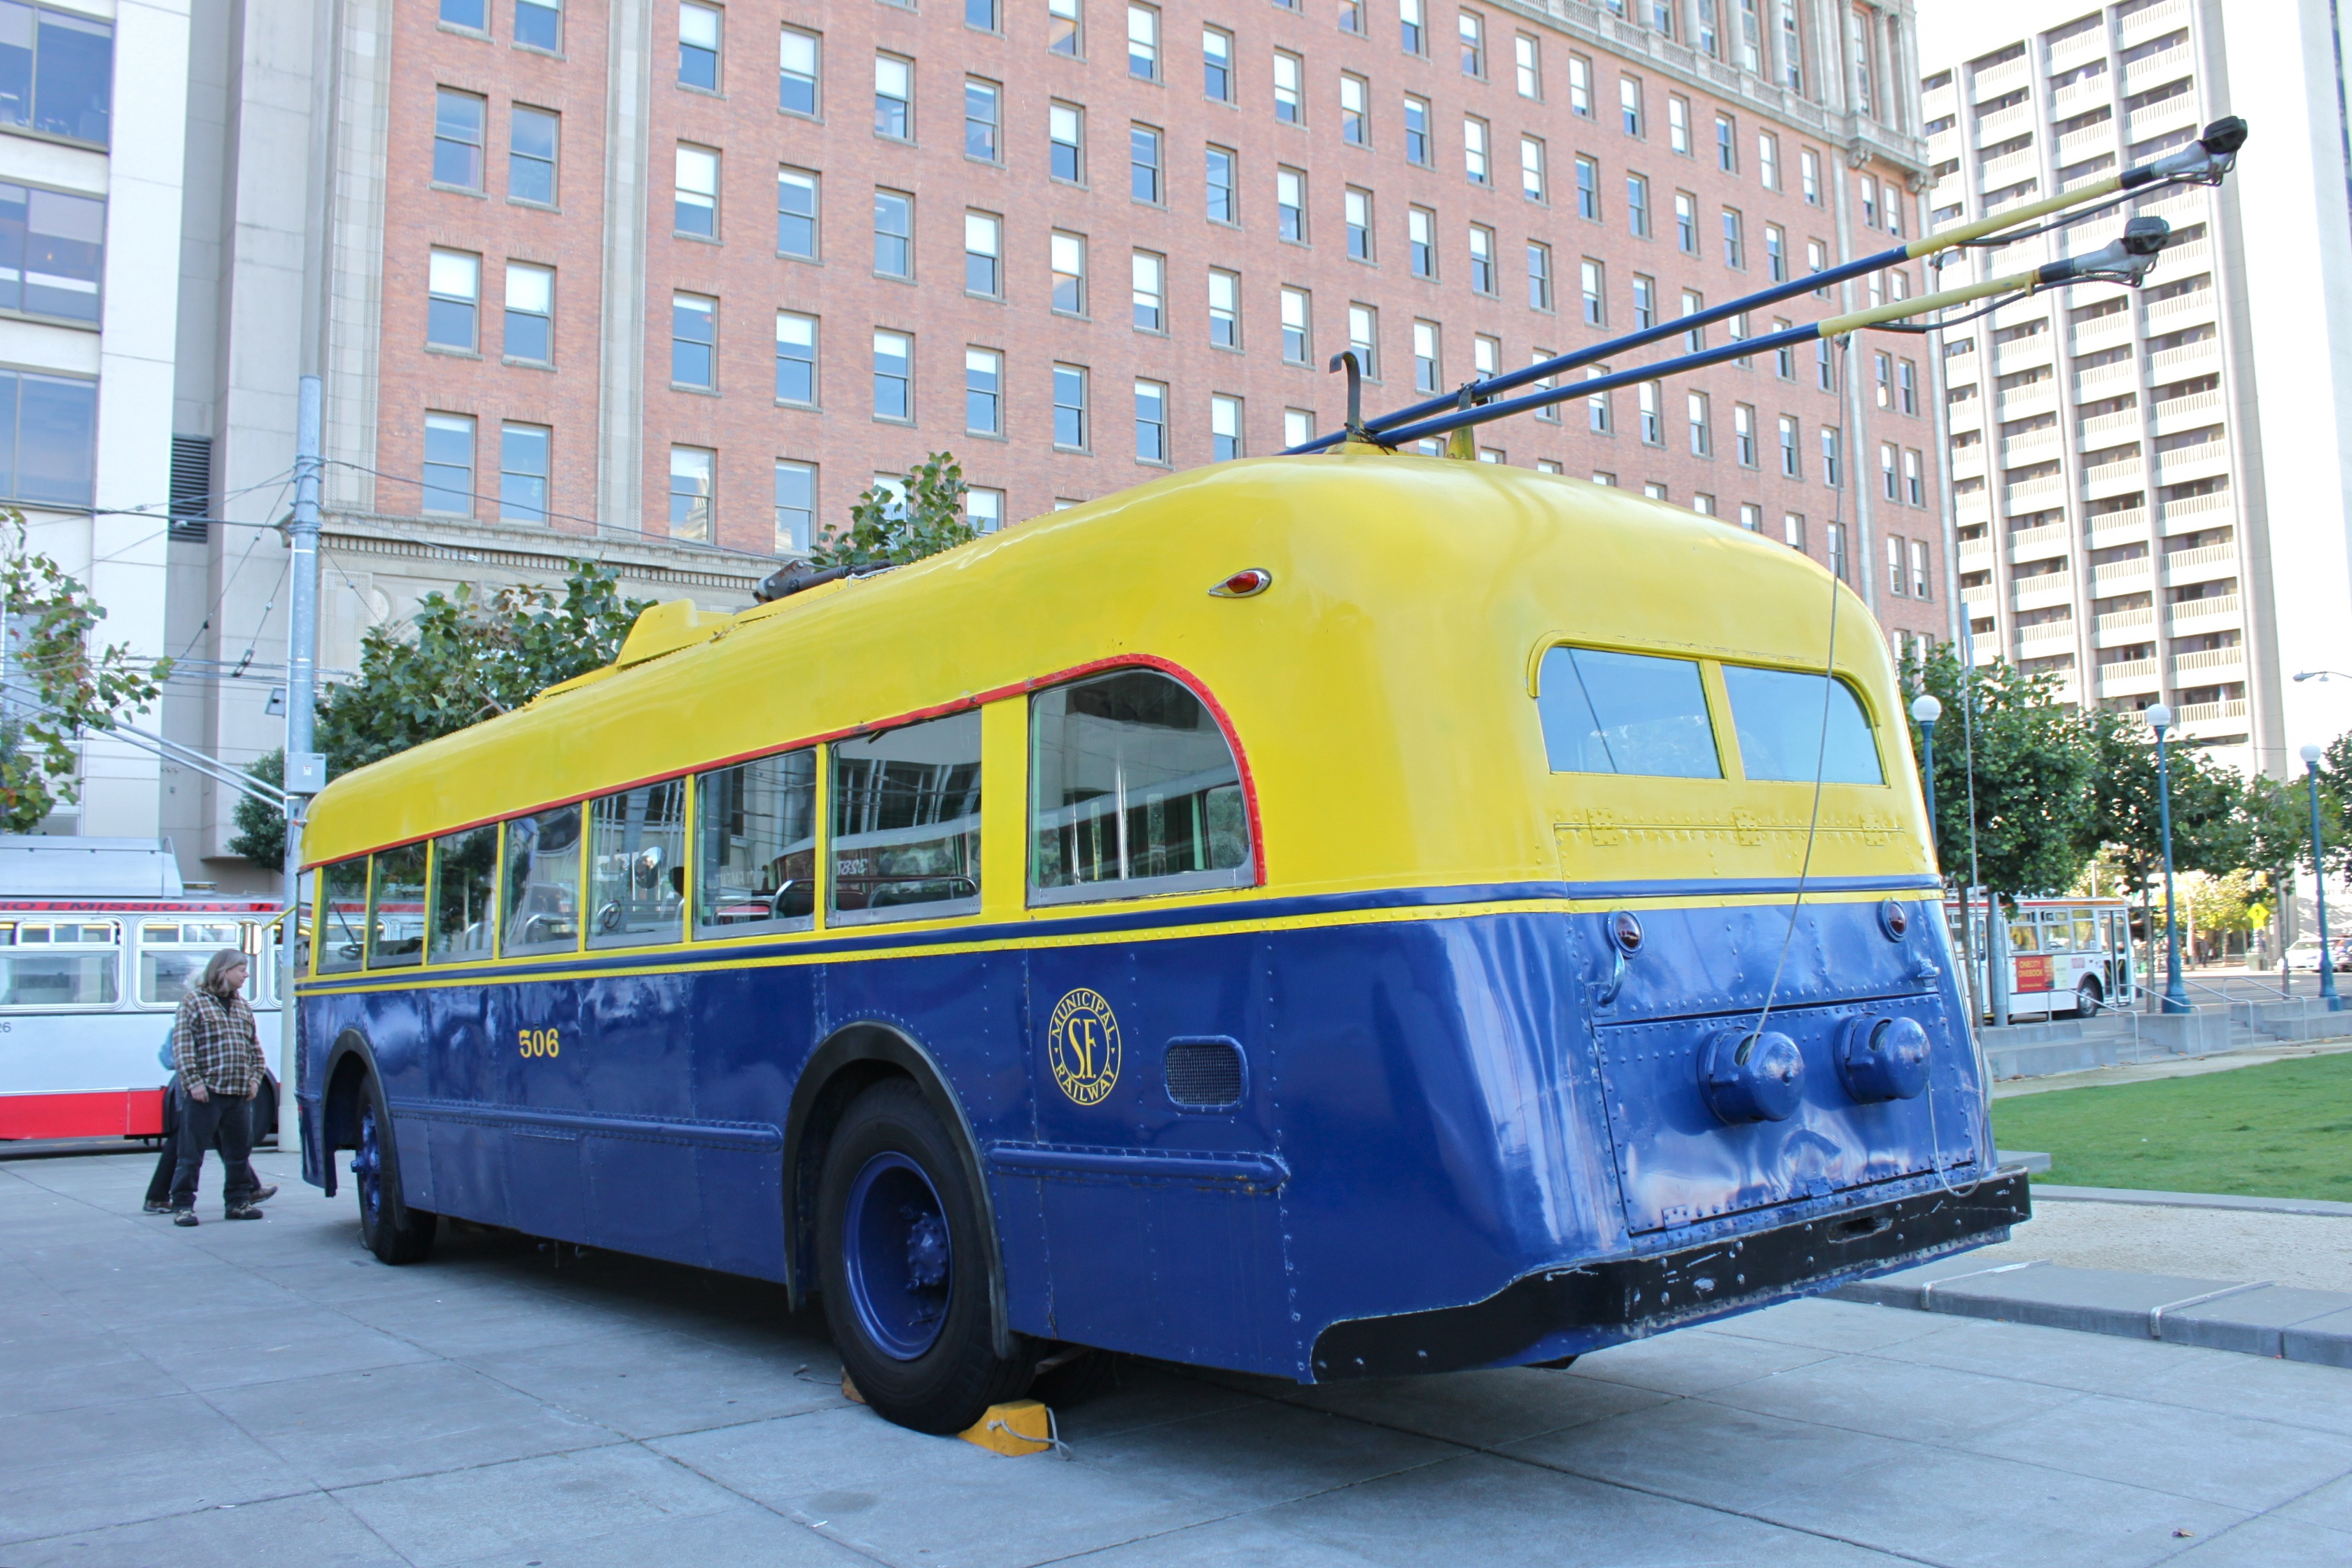 Muni Trolleys San Francisco File:san Francisco Muni